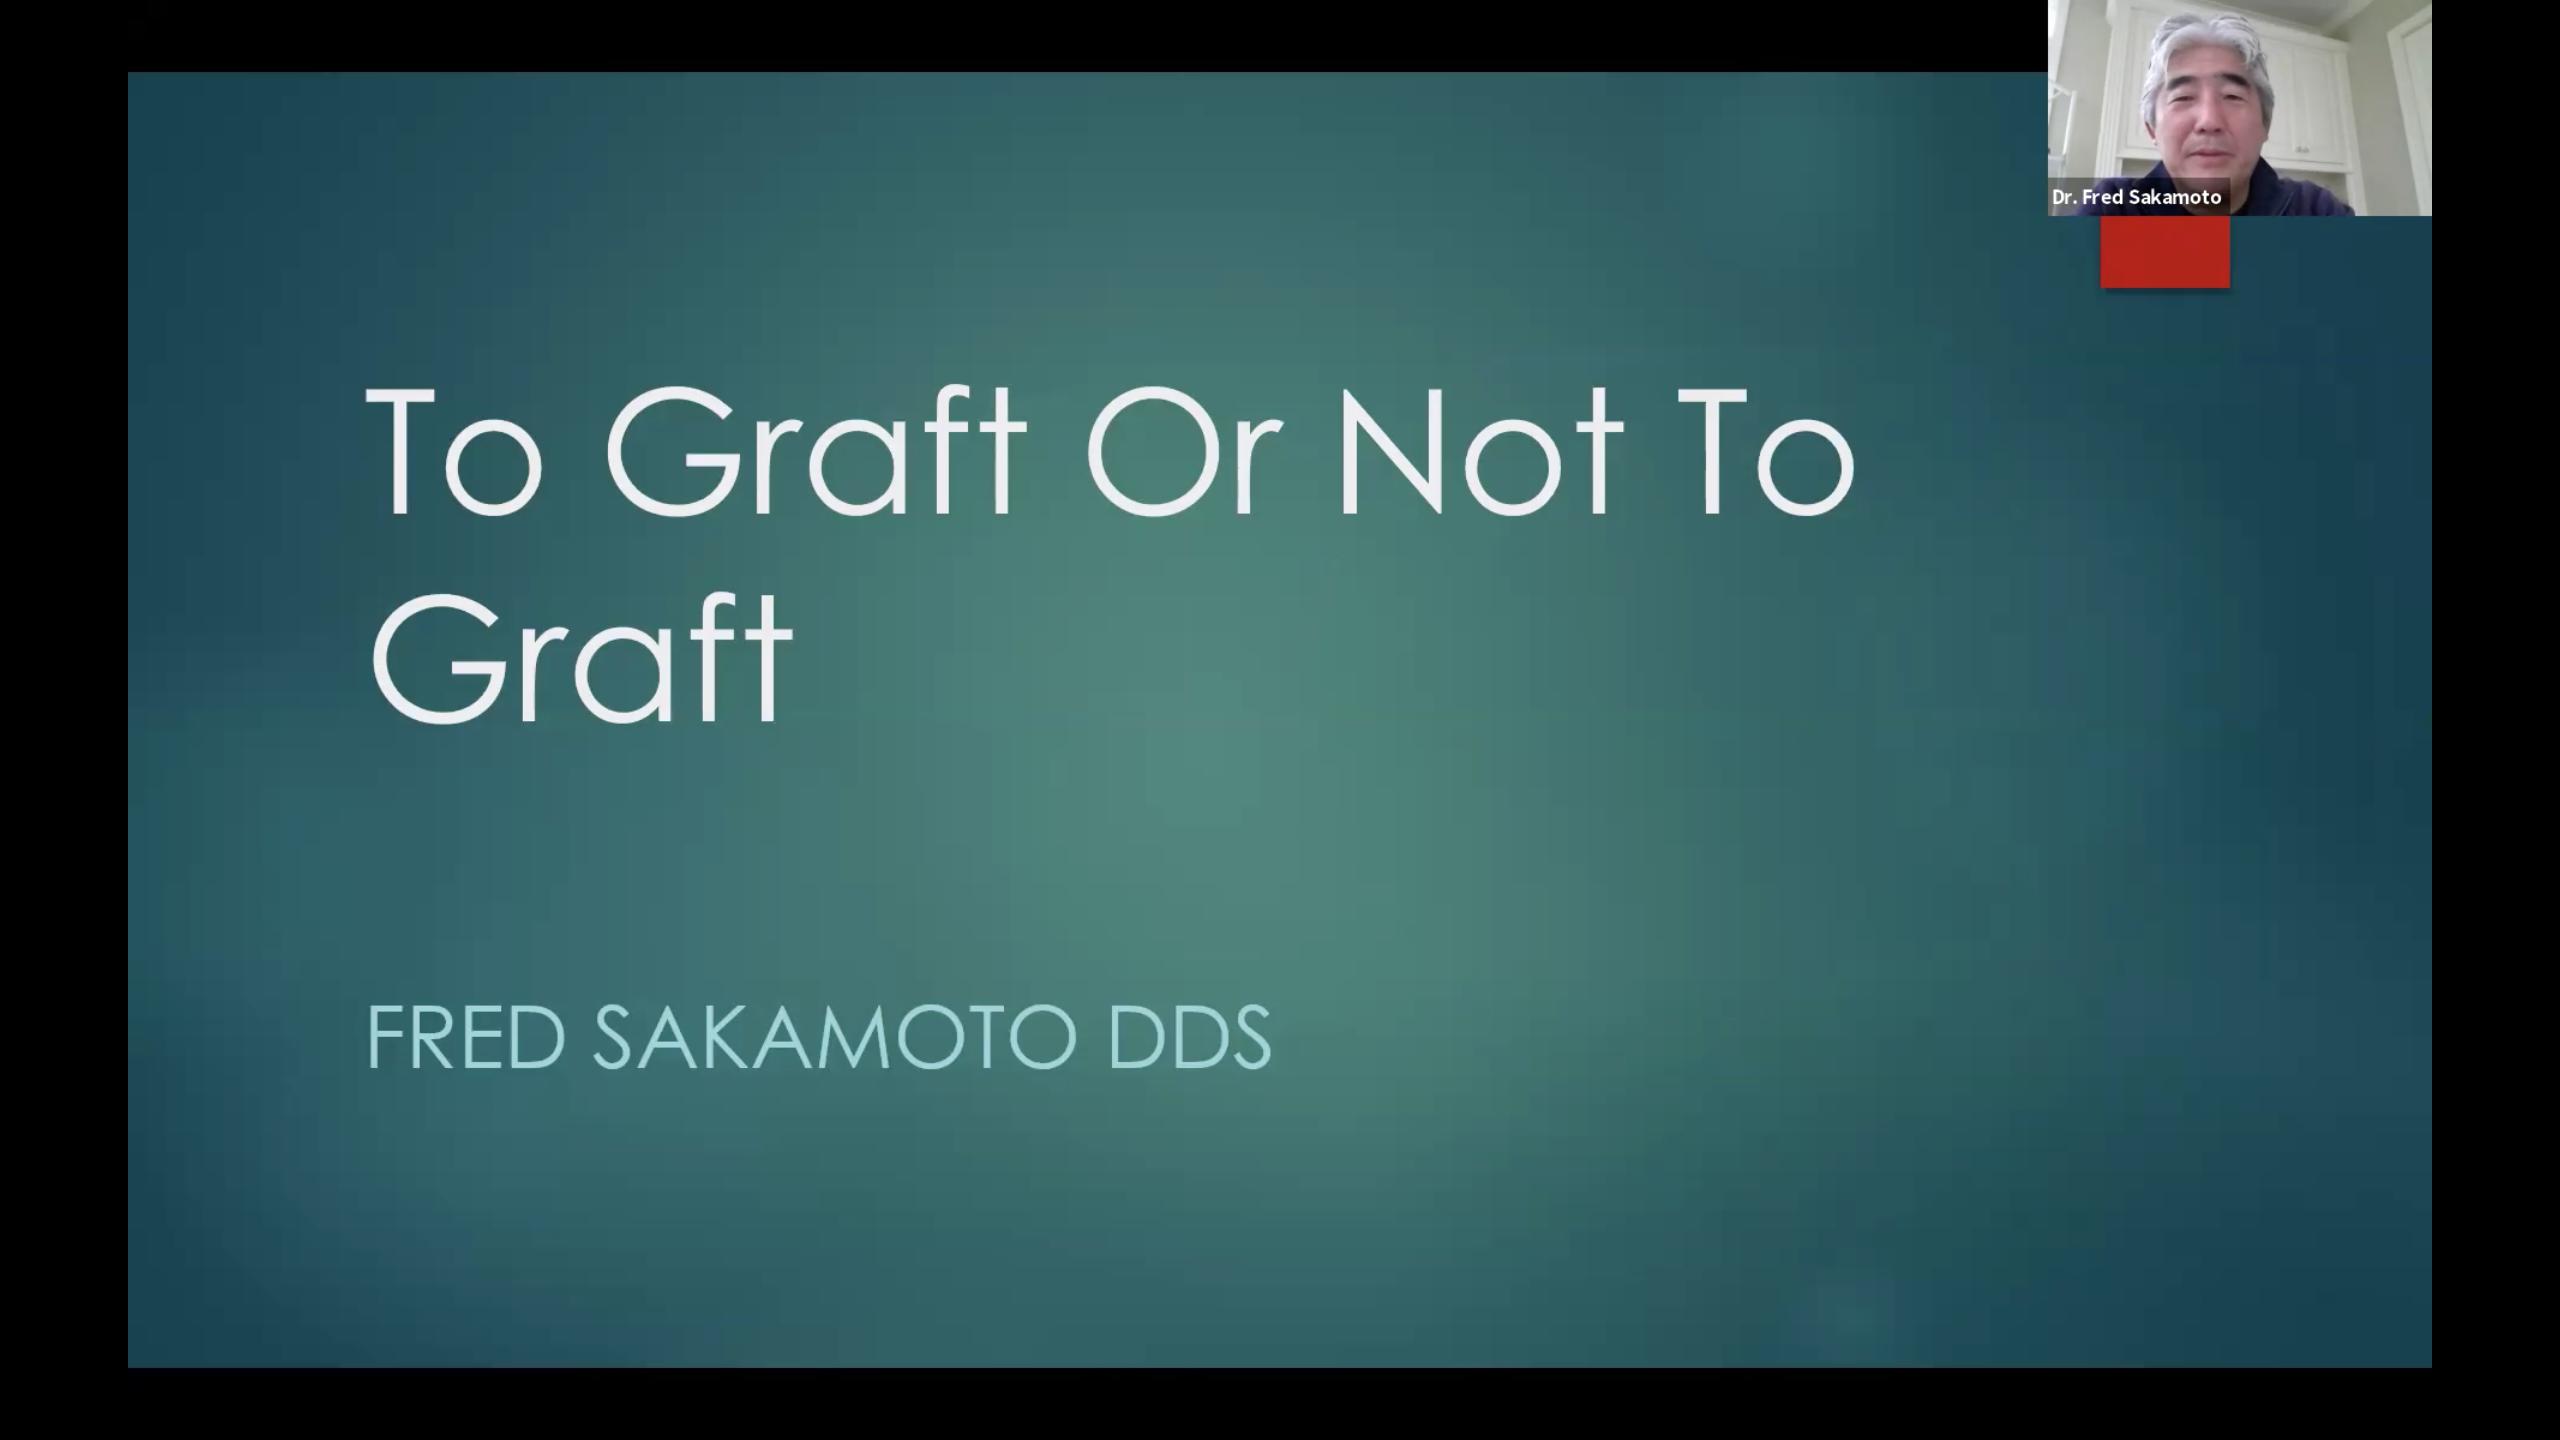 Webinar: To Graft or Not To Graft?